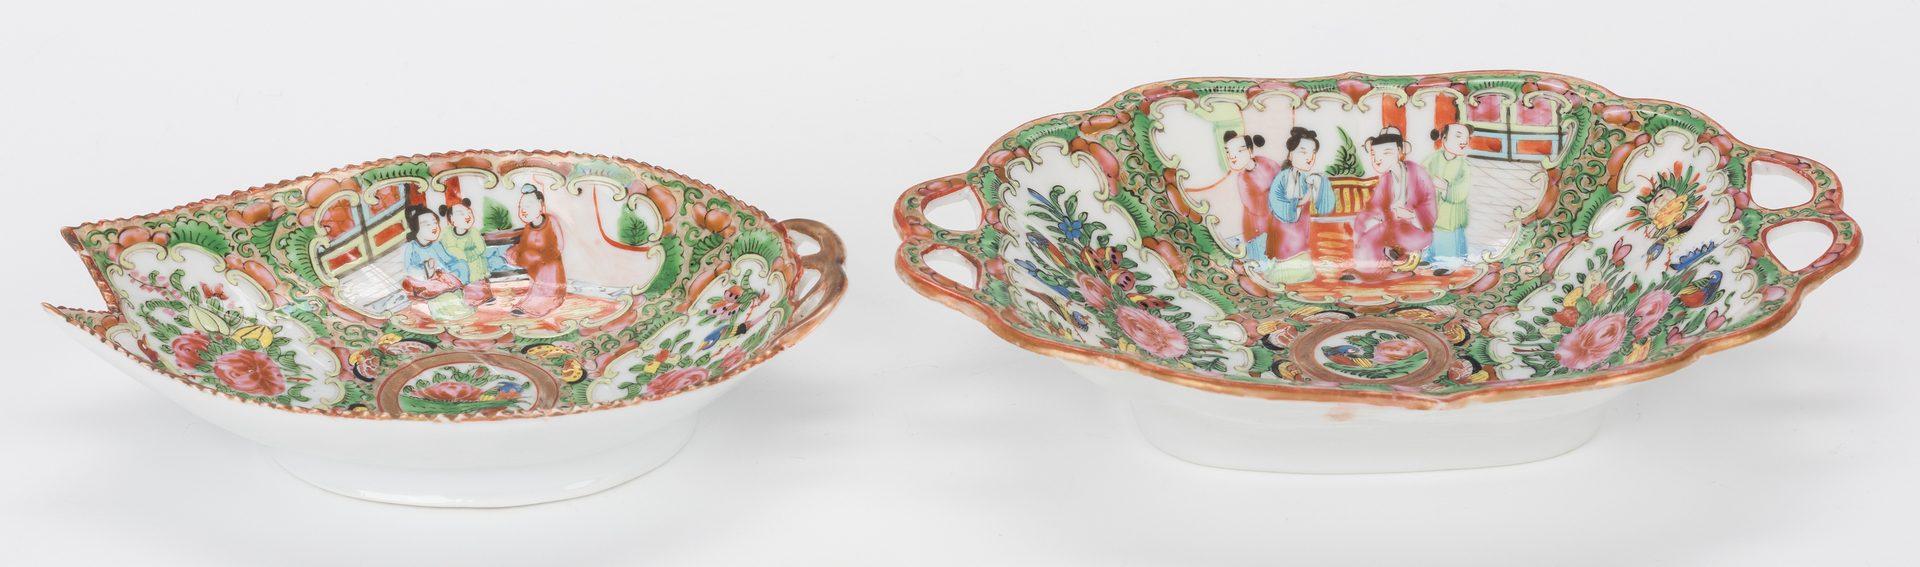 Lot 354: 4 Pcs. Chinese Rose Medallion Porcelain